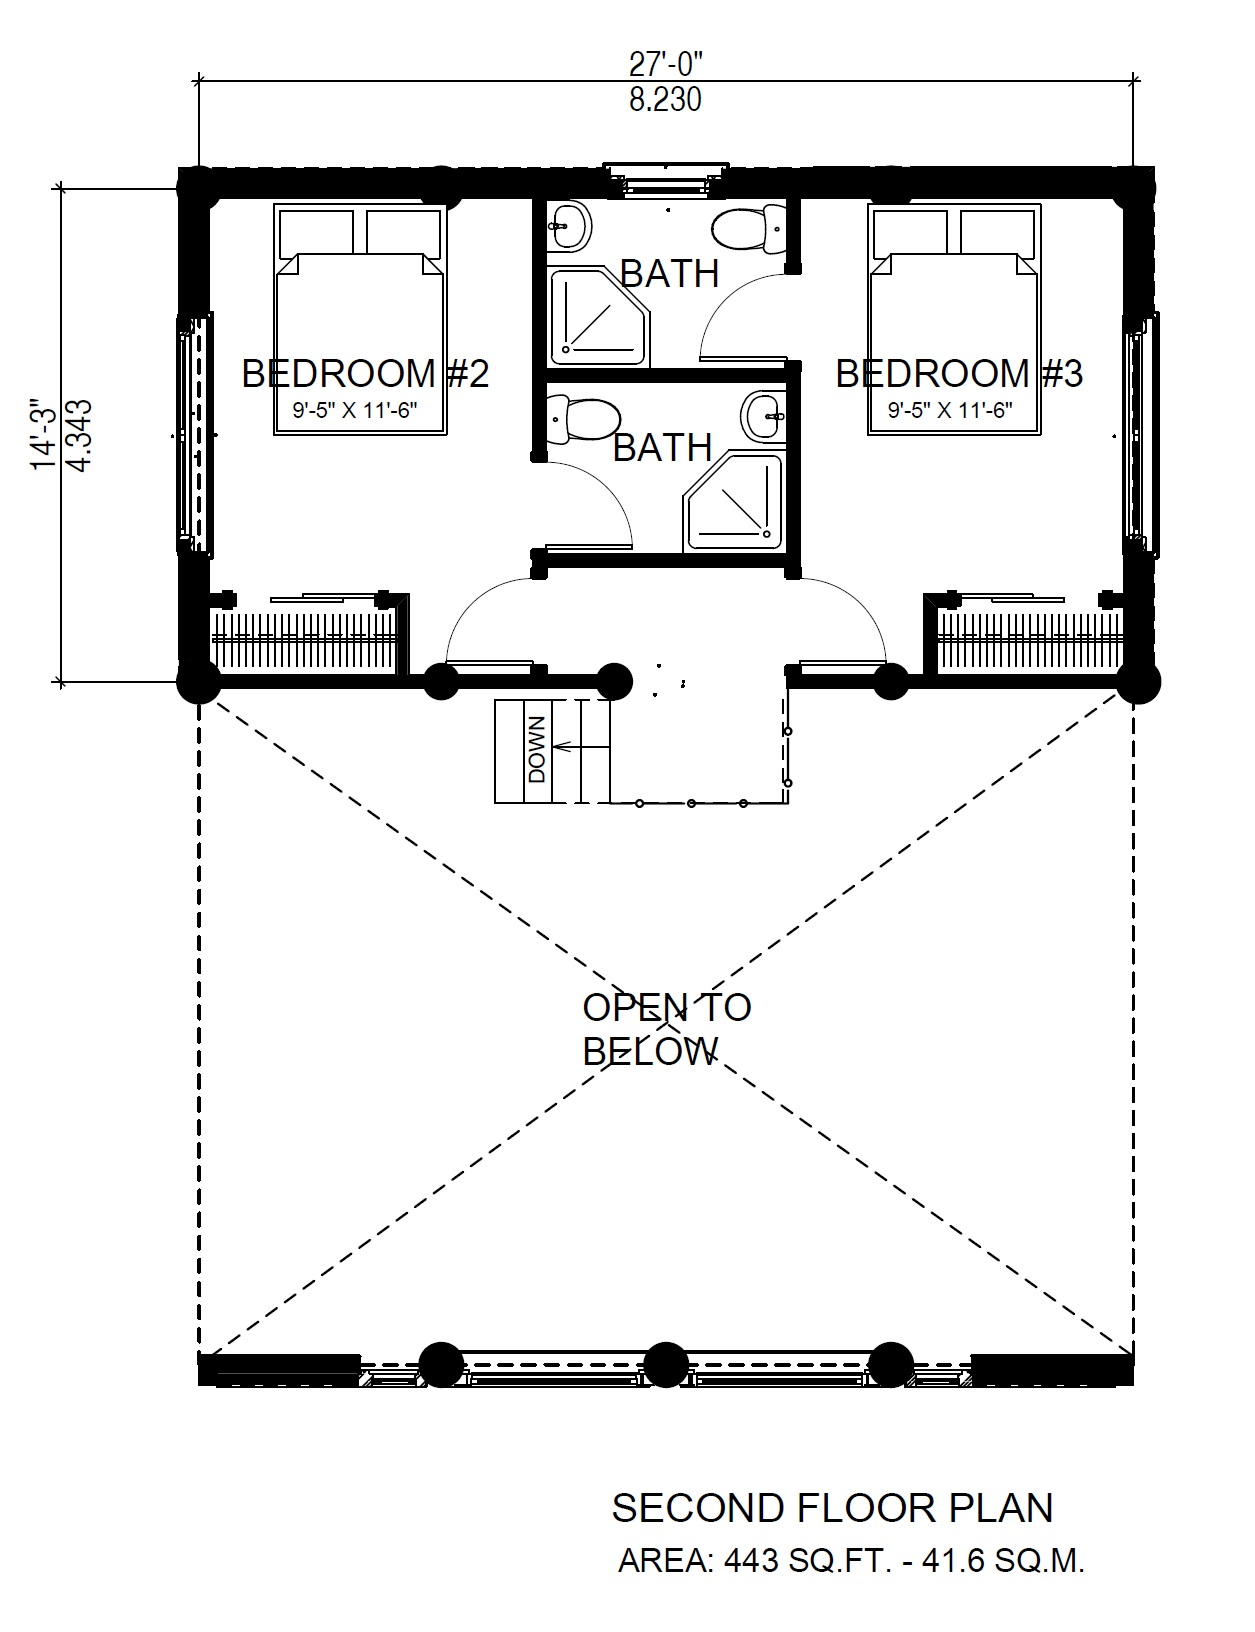 Horseshoe bay Log Cabin Variation Second Floor